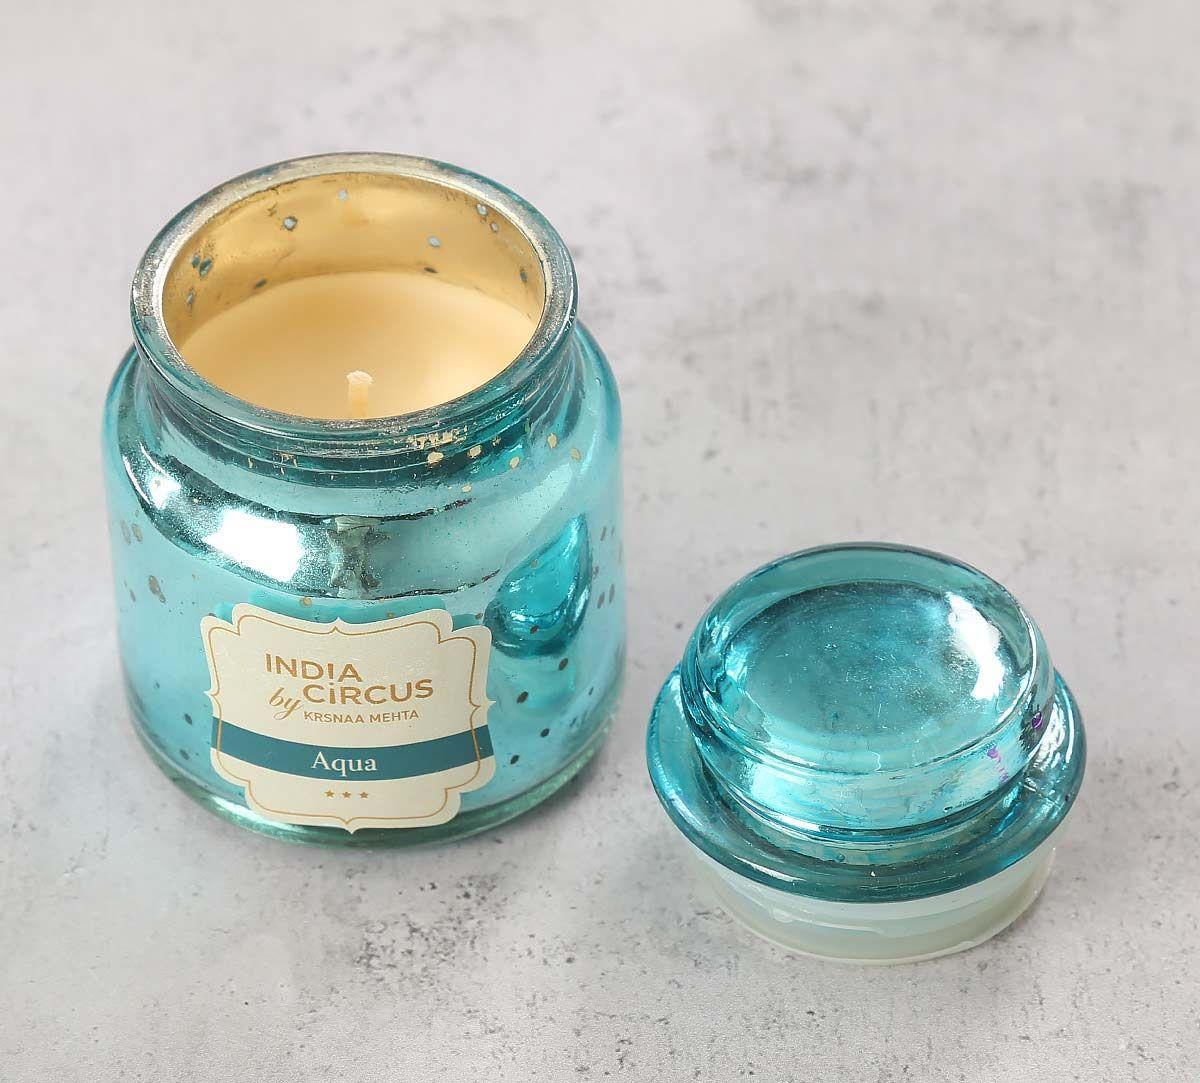 India Circus Aqua Yankee Jar Candle